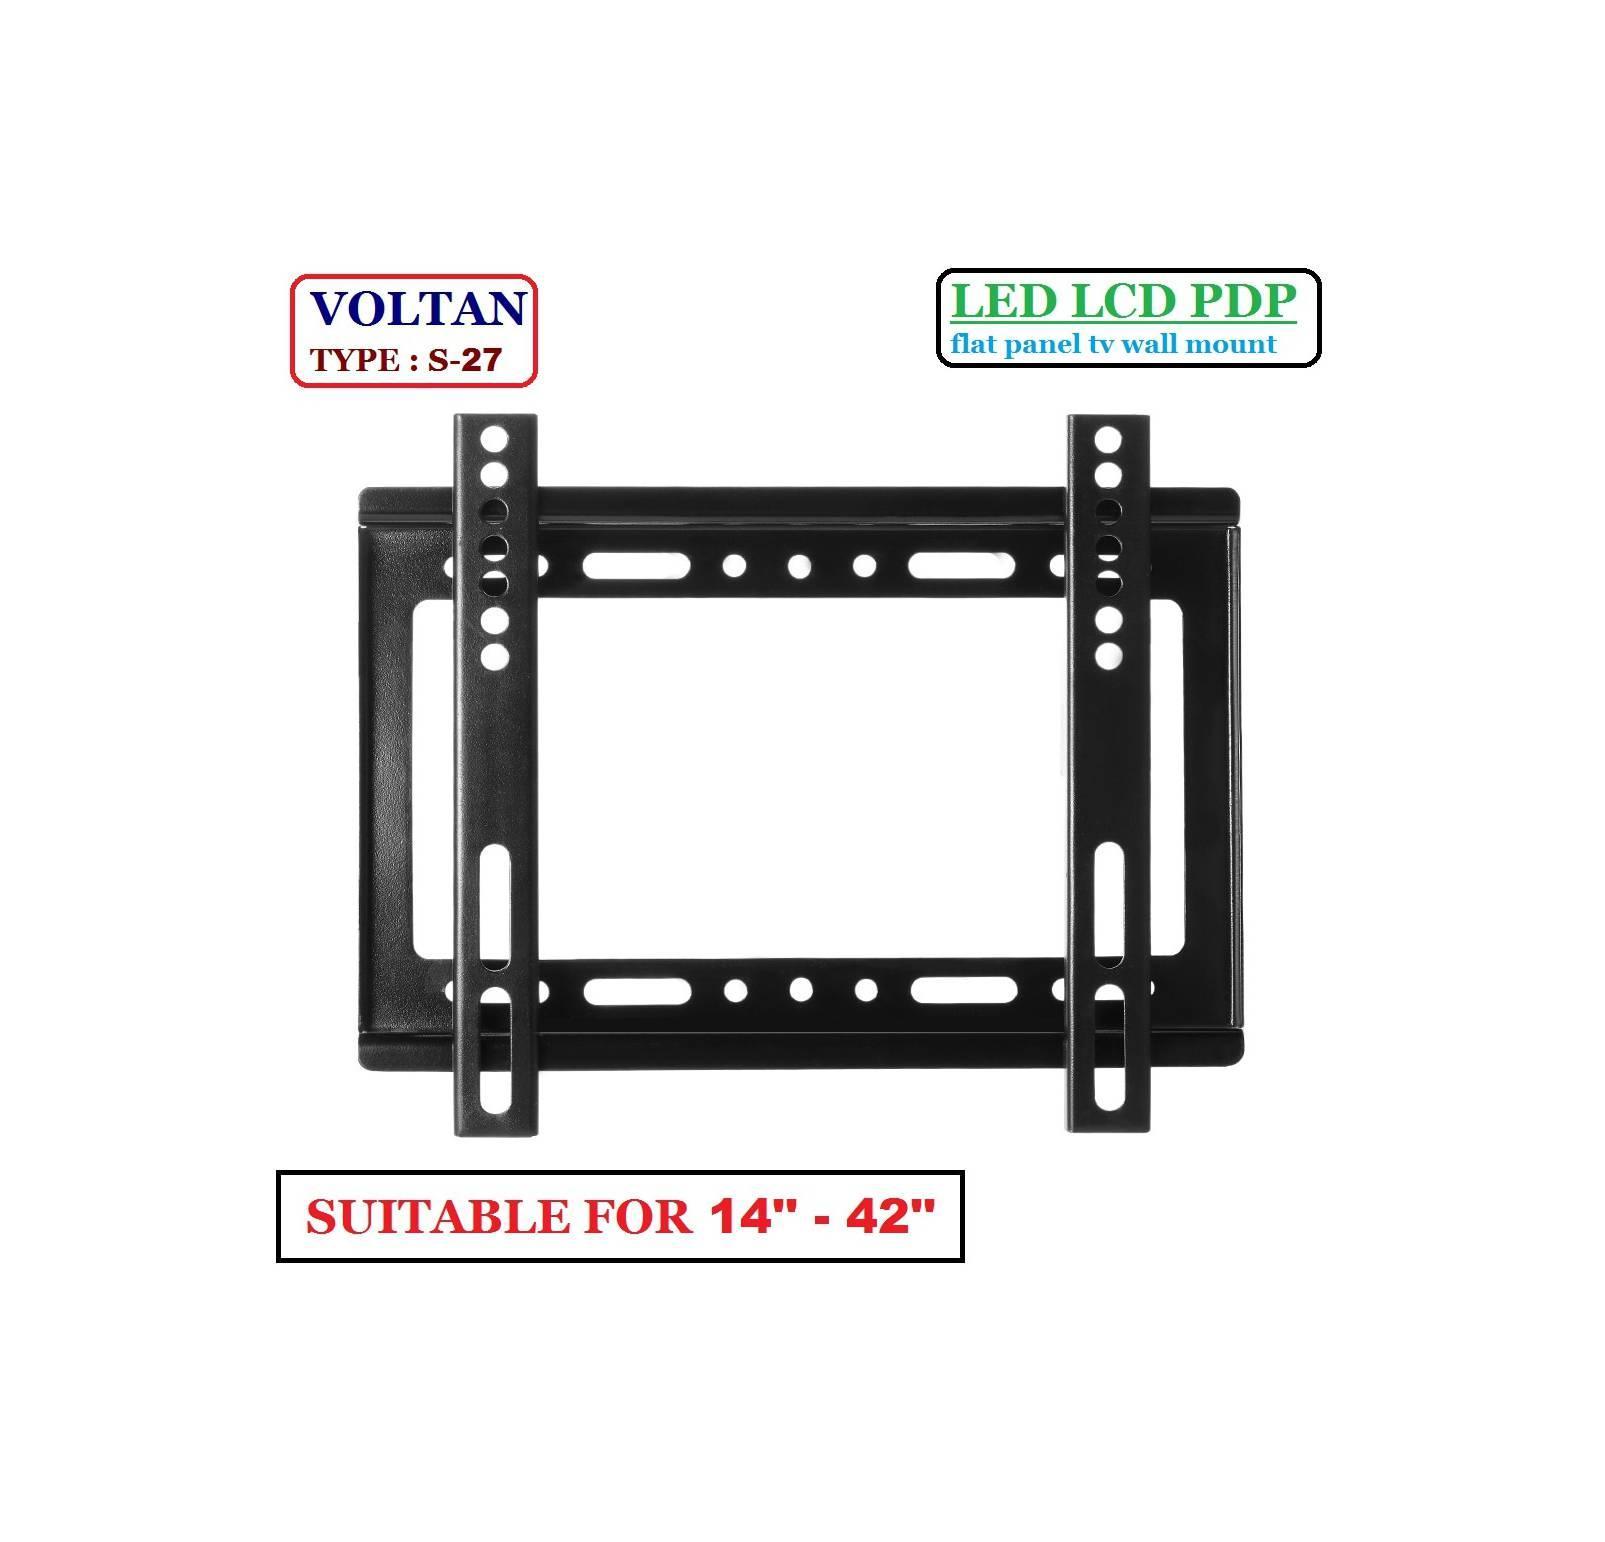 Fitur Paket Universal Main Board Mesin Driver Panel Layar Lcd Led Tv Monitor Lvds Fi 30pin Skr Diy Isi 7 Pcs Dudukan Bracket Braket 14 42nch